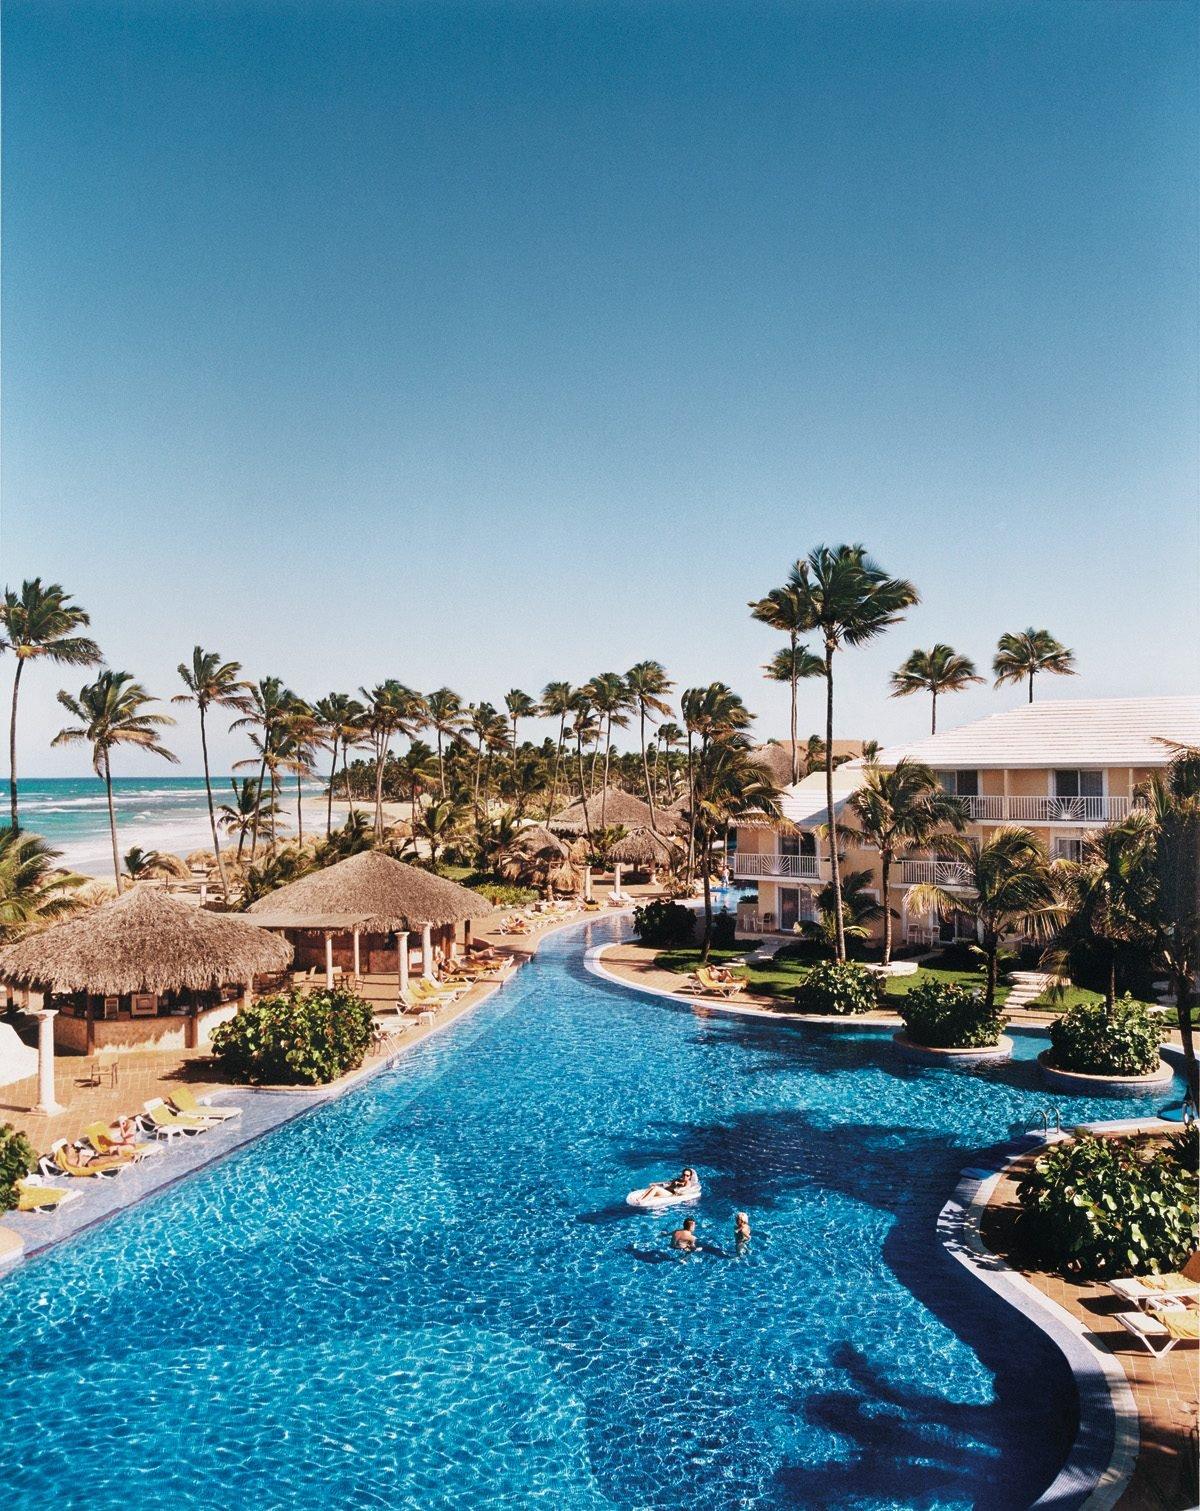 7. Excellence Punta Cana, Dominican Republic